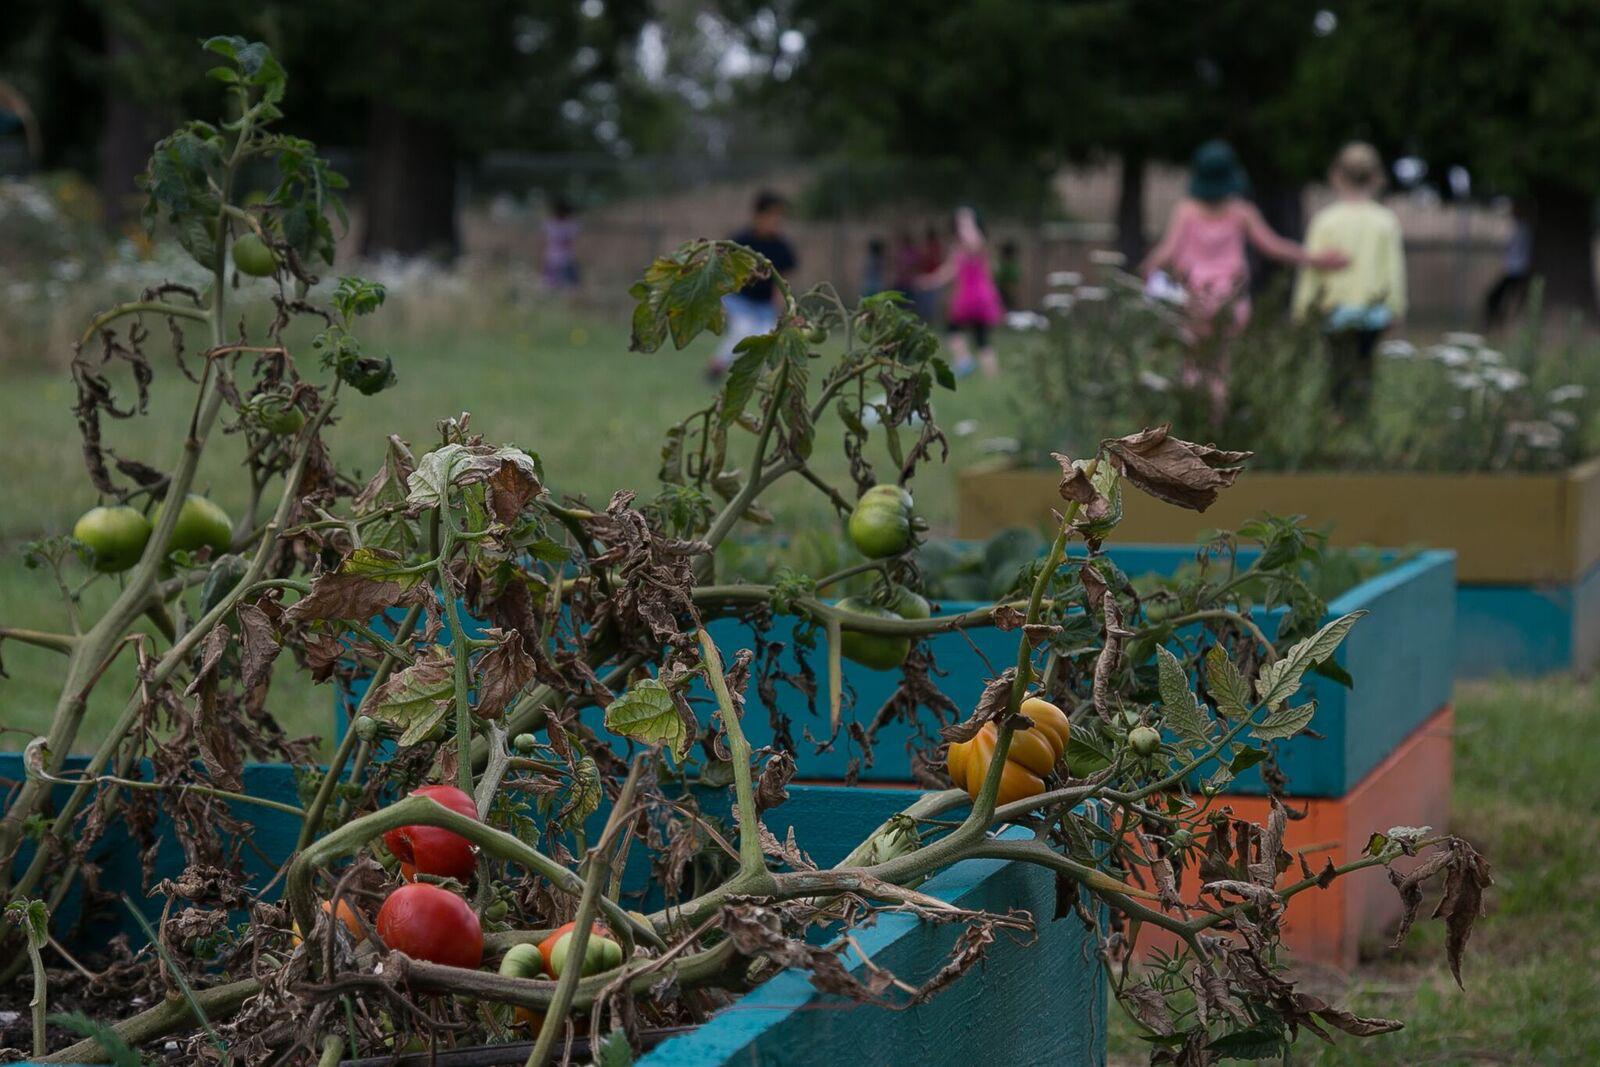 tomatoes-ses-garden-boxes.jpg